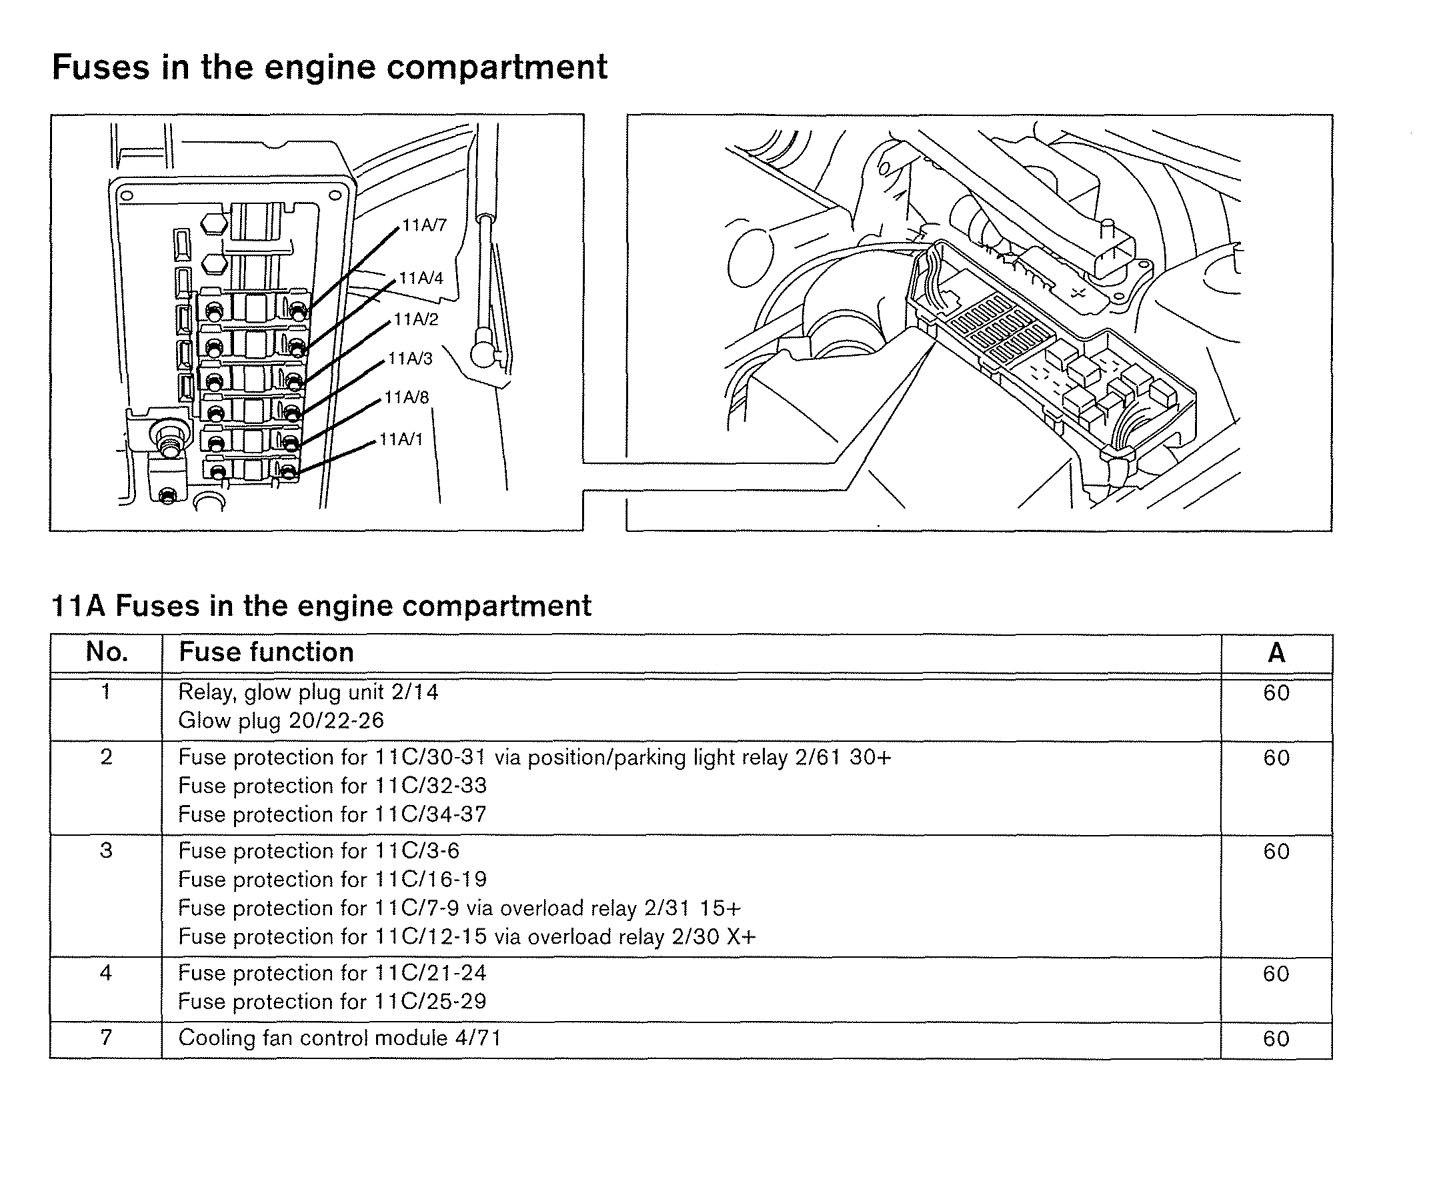 Volvo S40 Wiring Schematic - Wiring Diagram 500 on volvo s40 brochure, volvo s40 thermostat, volvo s40 engine removal, volvo s40 ignition switch, volvo amazon wiring diagram, volvo s40 frame, volvo s40 coolant diagram, volvo s40 engine problems, volvo s40 relay location, volvo s40 valve cover removal, volvo s40 vacuum diagram, volvo s40 starter, volvo s40 speaker, volvo s40 antenna, volvo s40 stereo diagram, volvo s40 steering diagram, volvo s40 firing order, volvo s40 engine diagram, volvo s40 body, volvo ignition wiring diagram,